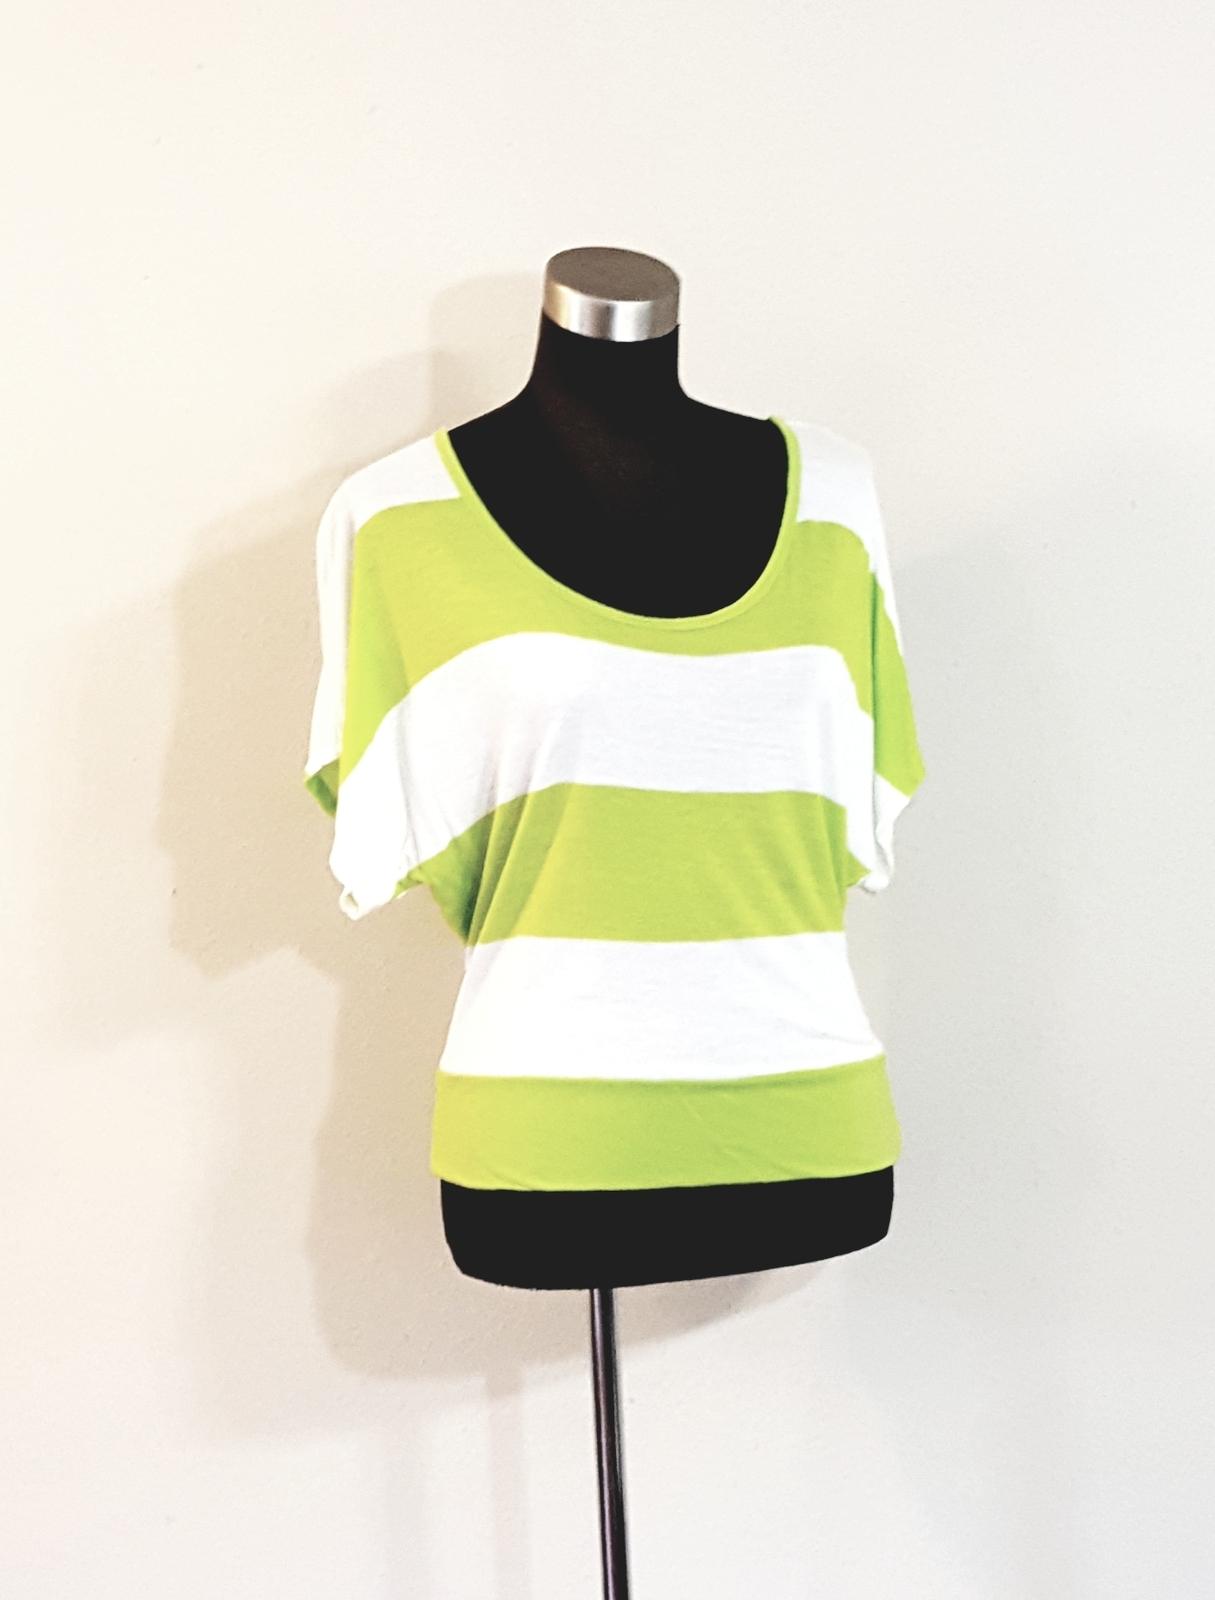 ba7ad29651 Casual Dresses For Juniors Rue21 - Gomes Weine AG